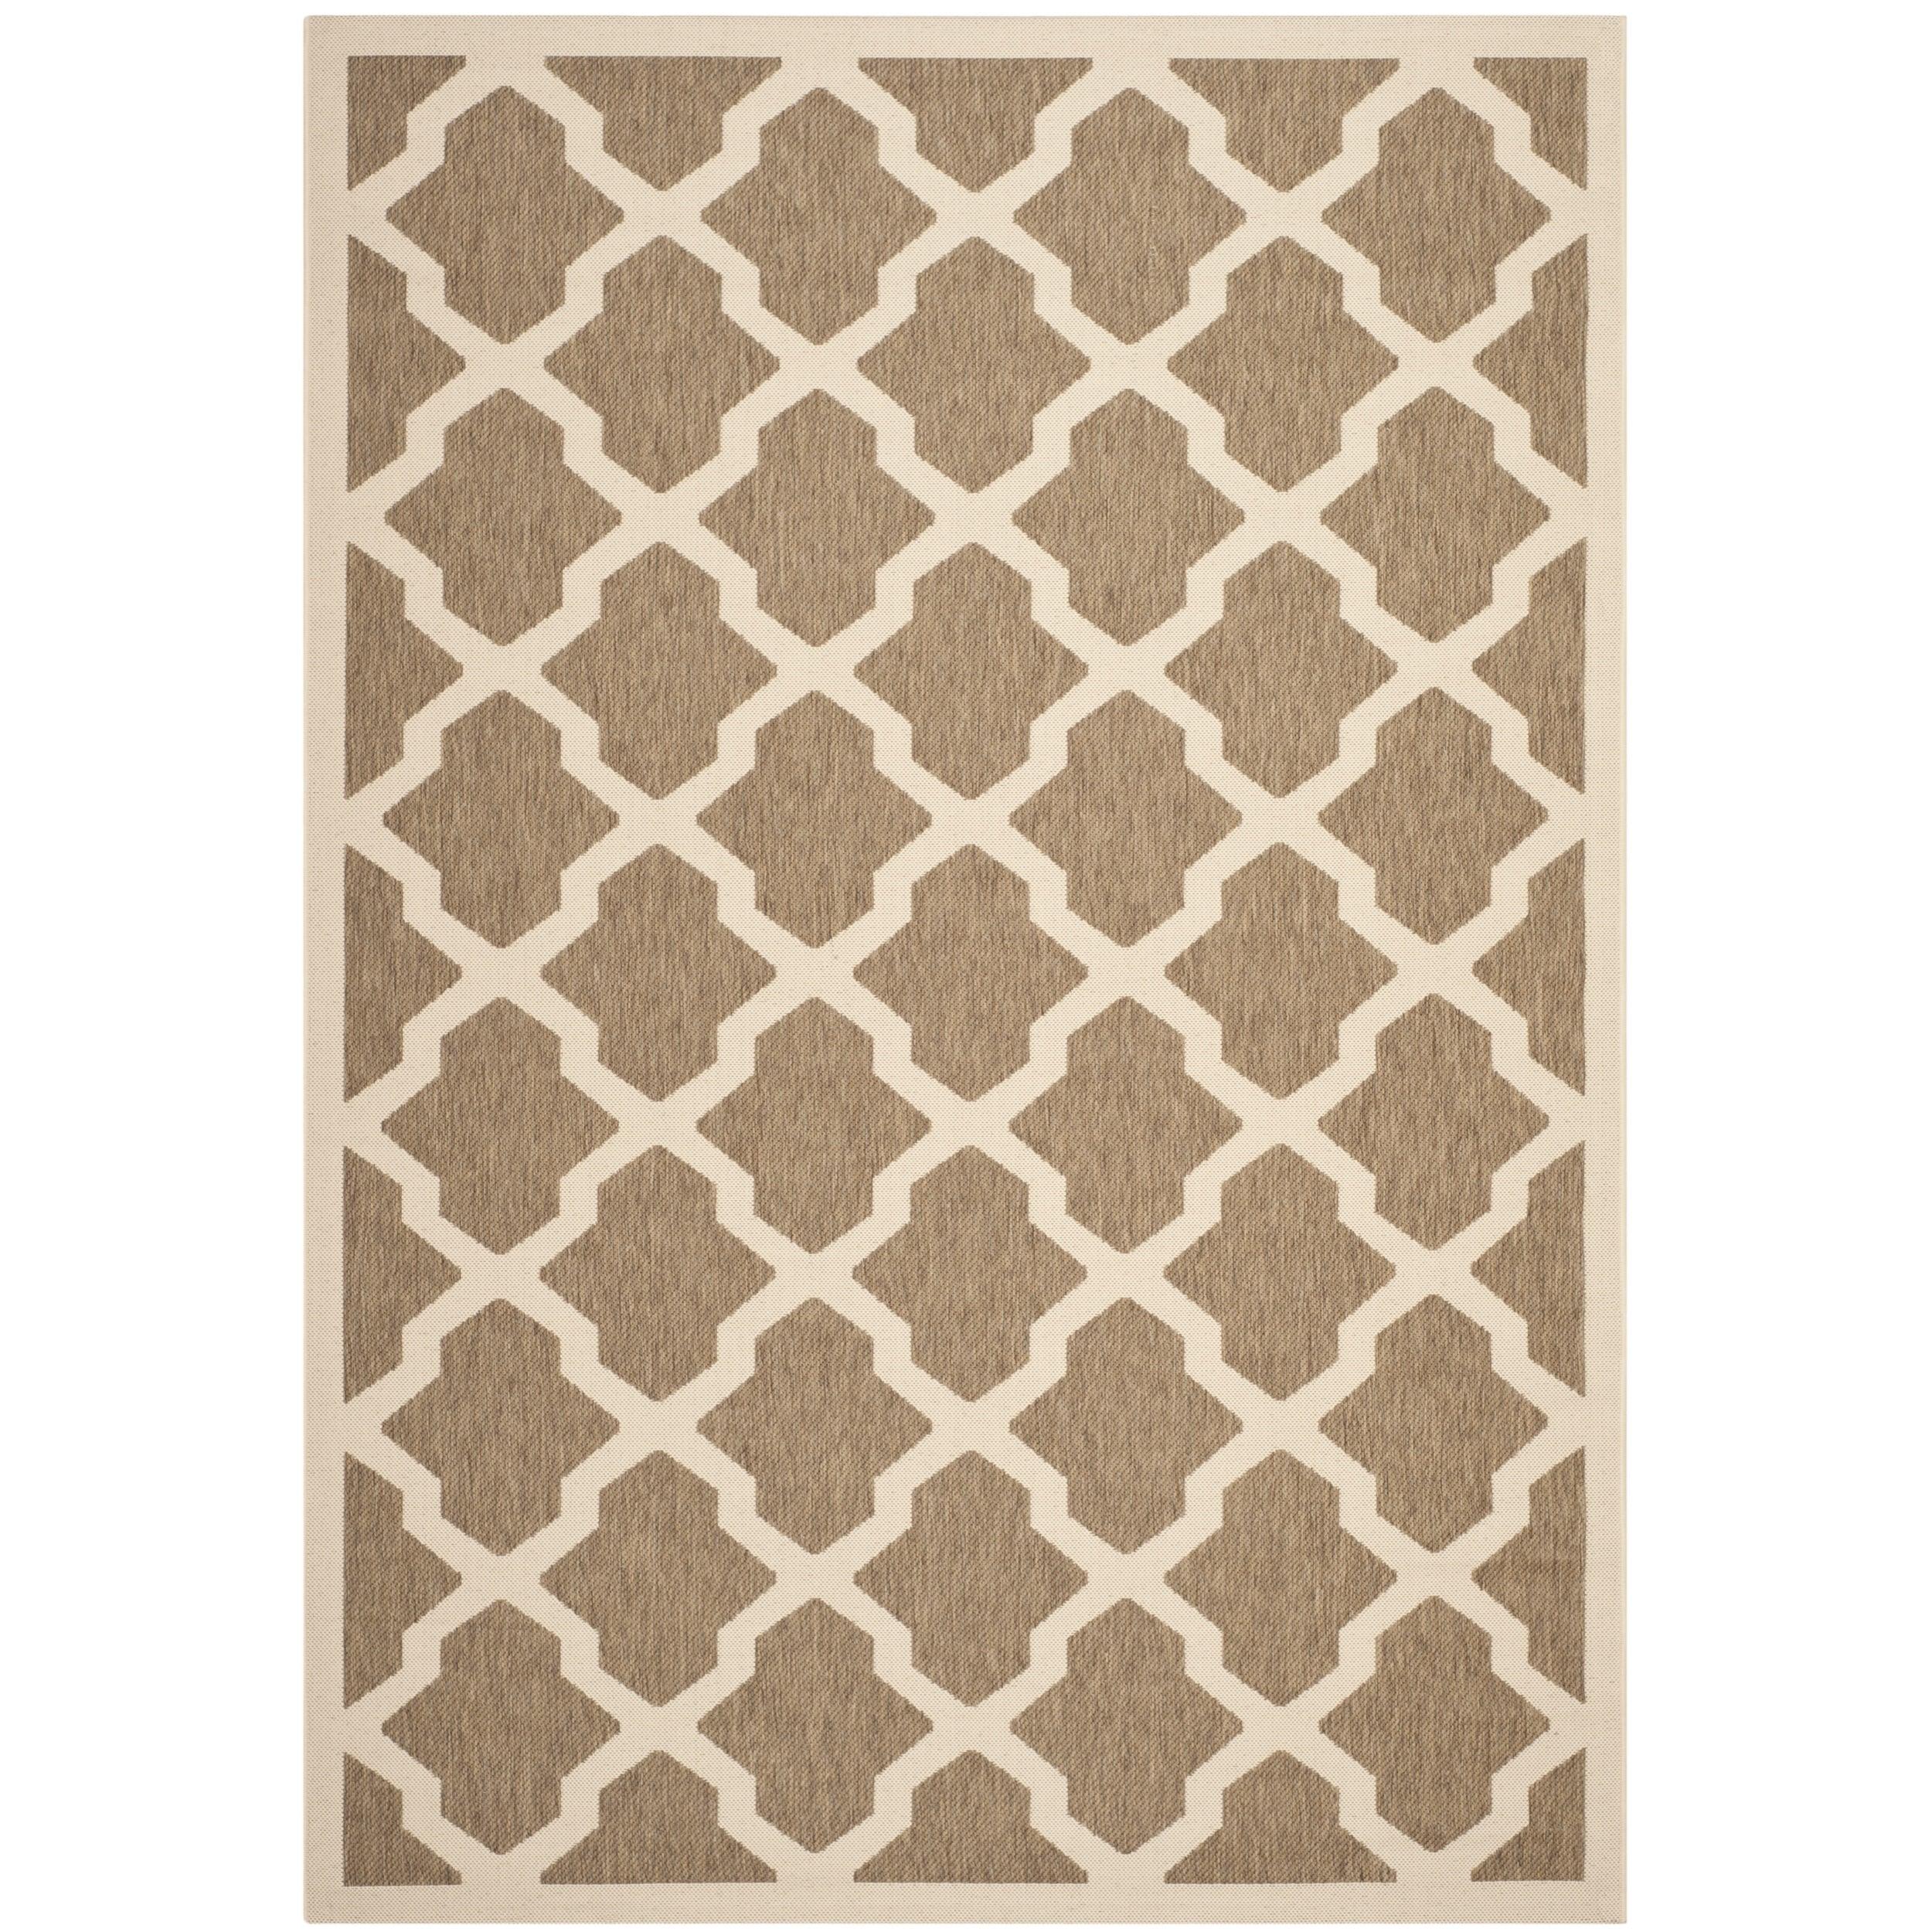 Contemporary Safavieh Indoor/ Outdoor Courtyard Brown/ Bone Rug (4 X 57)